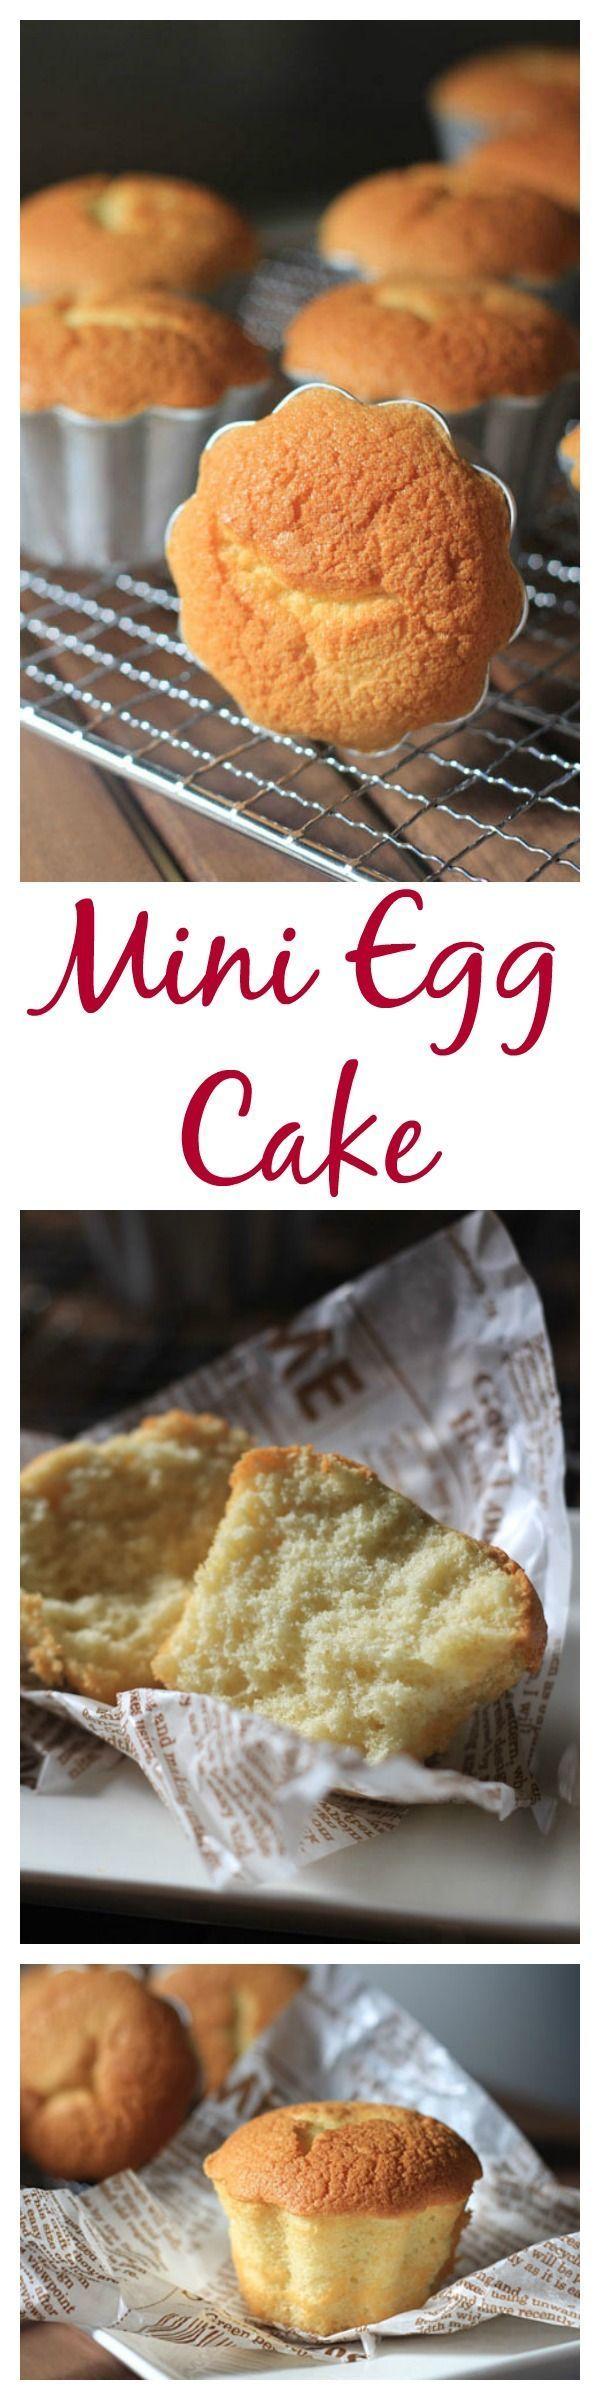 Mini egg cake. Soft, airy, light sponge cake. Learn how to make these mini cakes | rasamalaysia.com